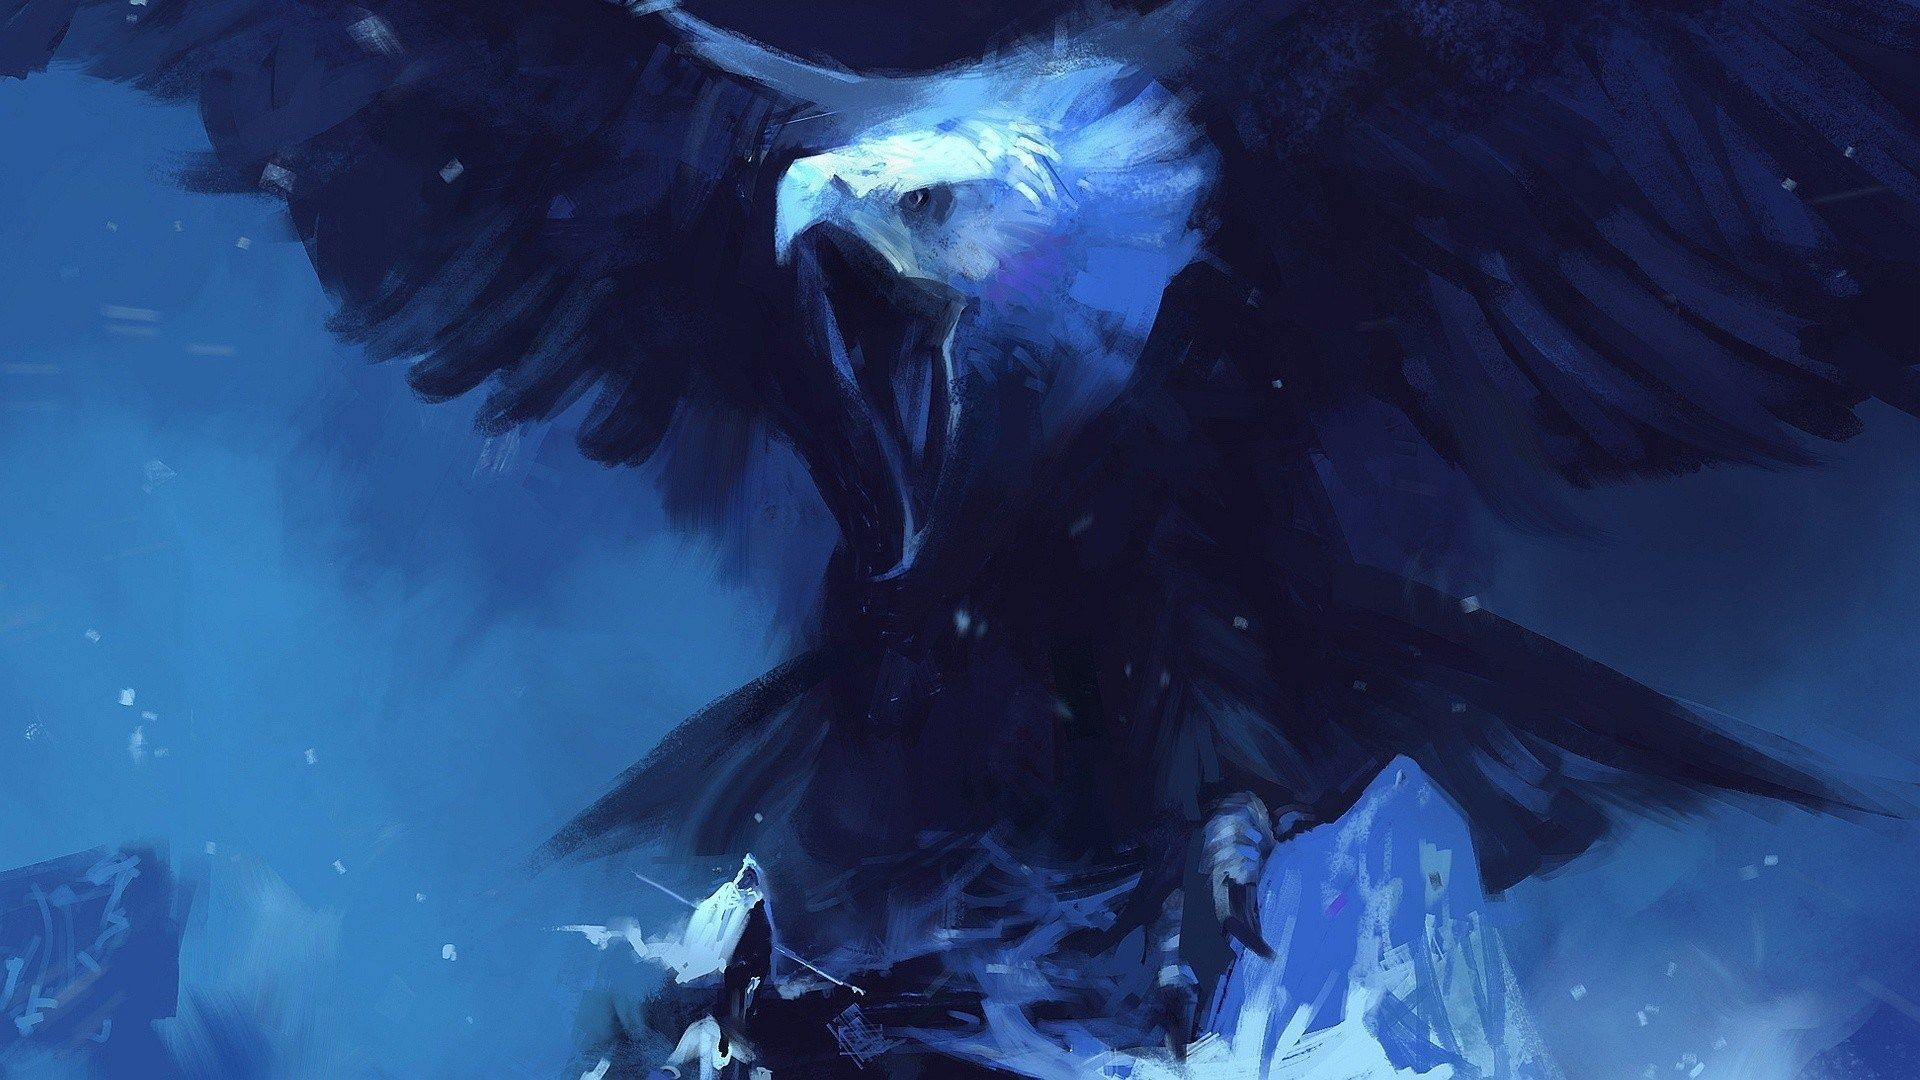 Fantasy Blue Dragon wallpaper